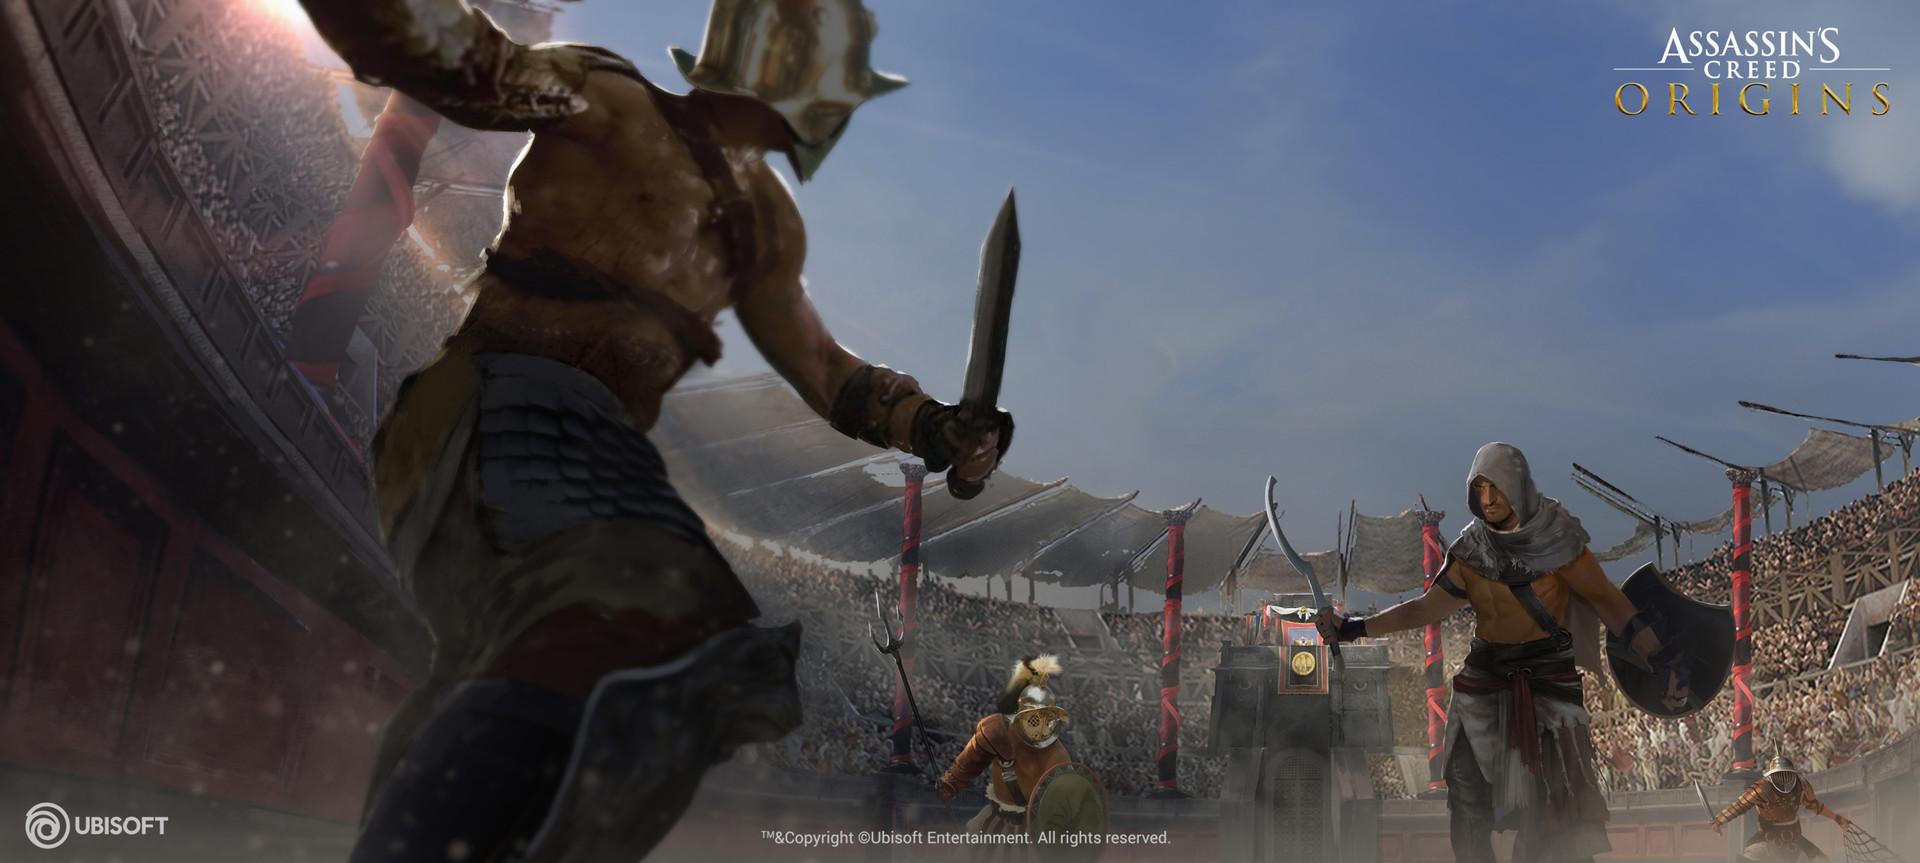 ivan-koritarev-ace-gladiator-arena-fight-ext-01-itkoritarev